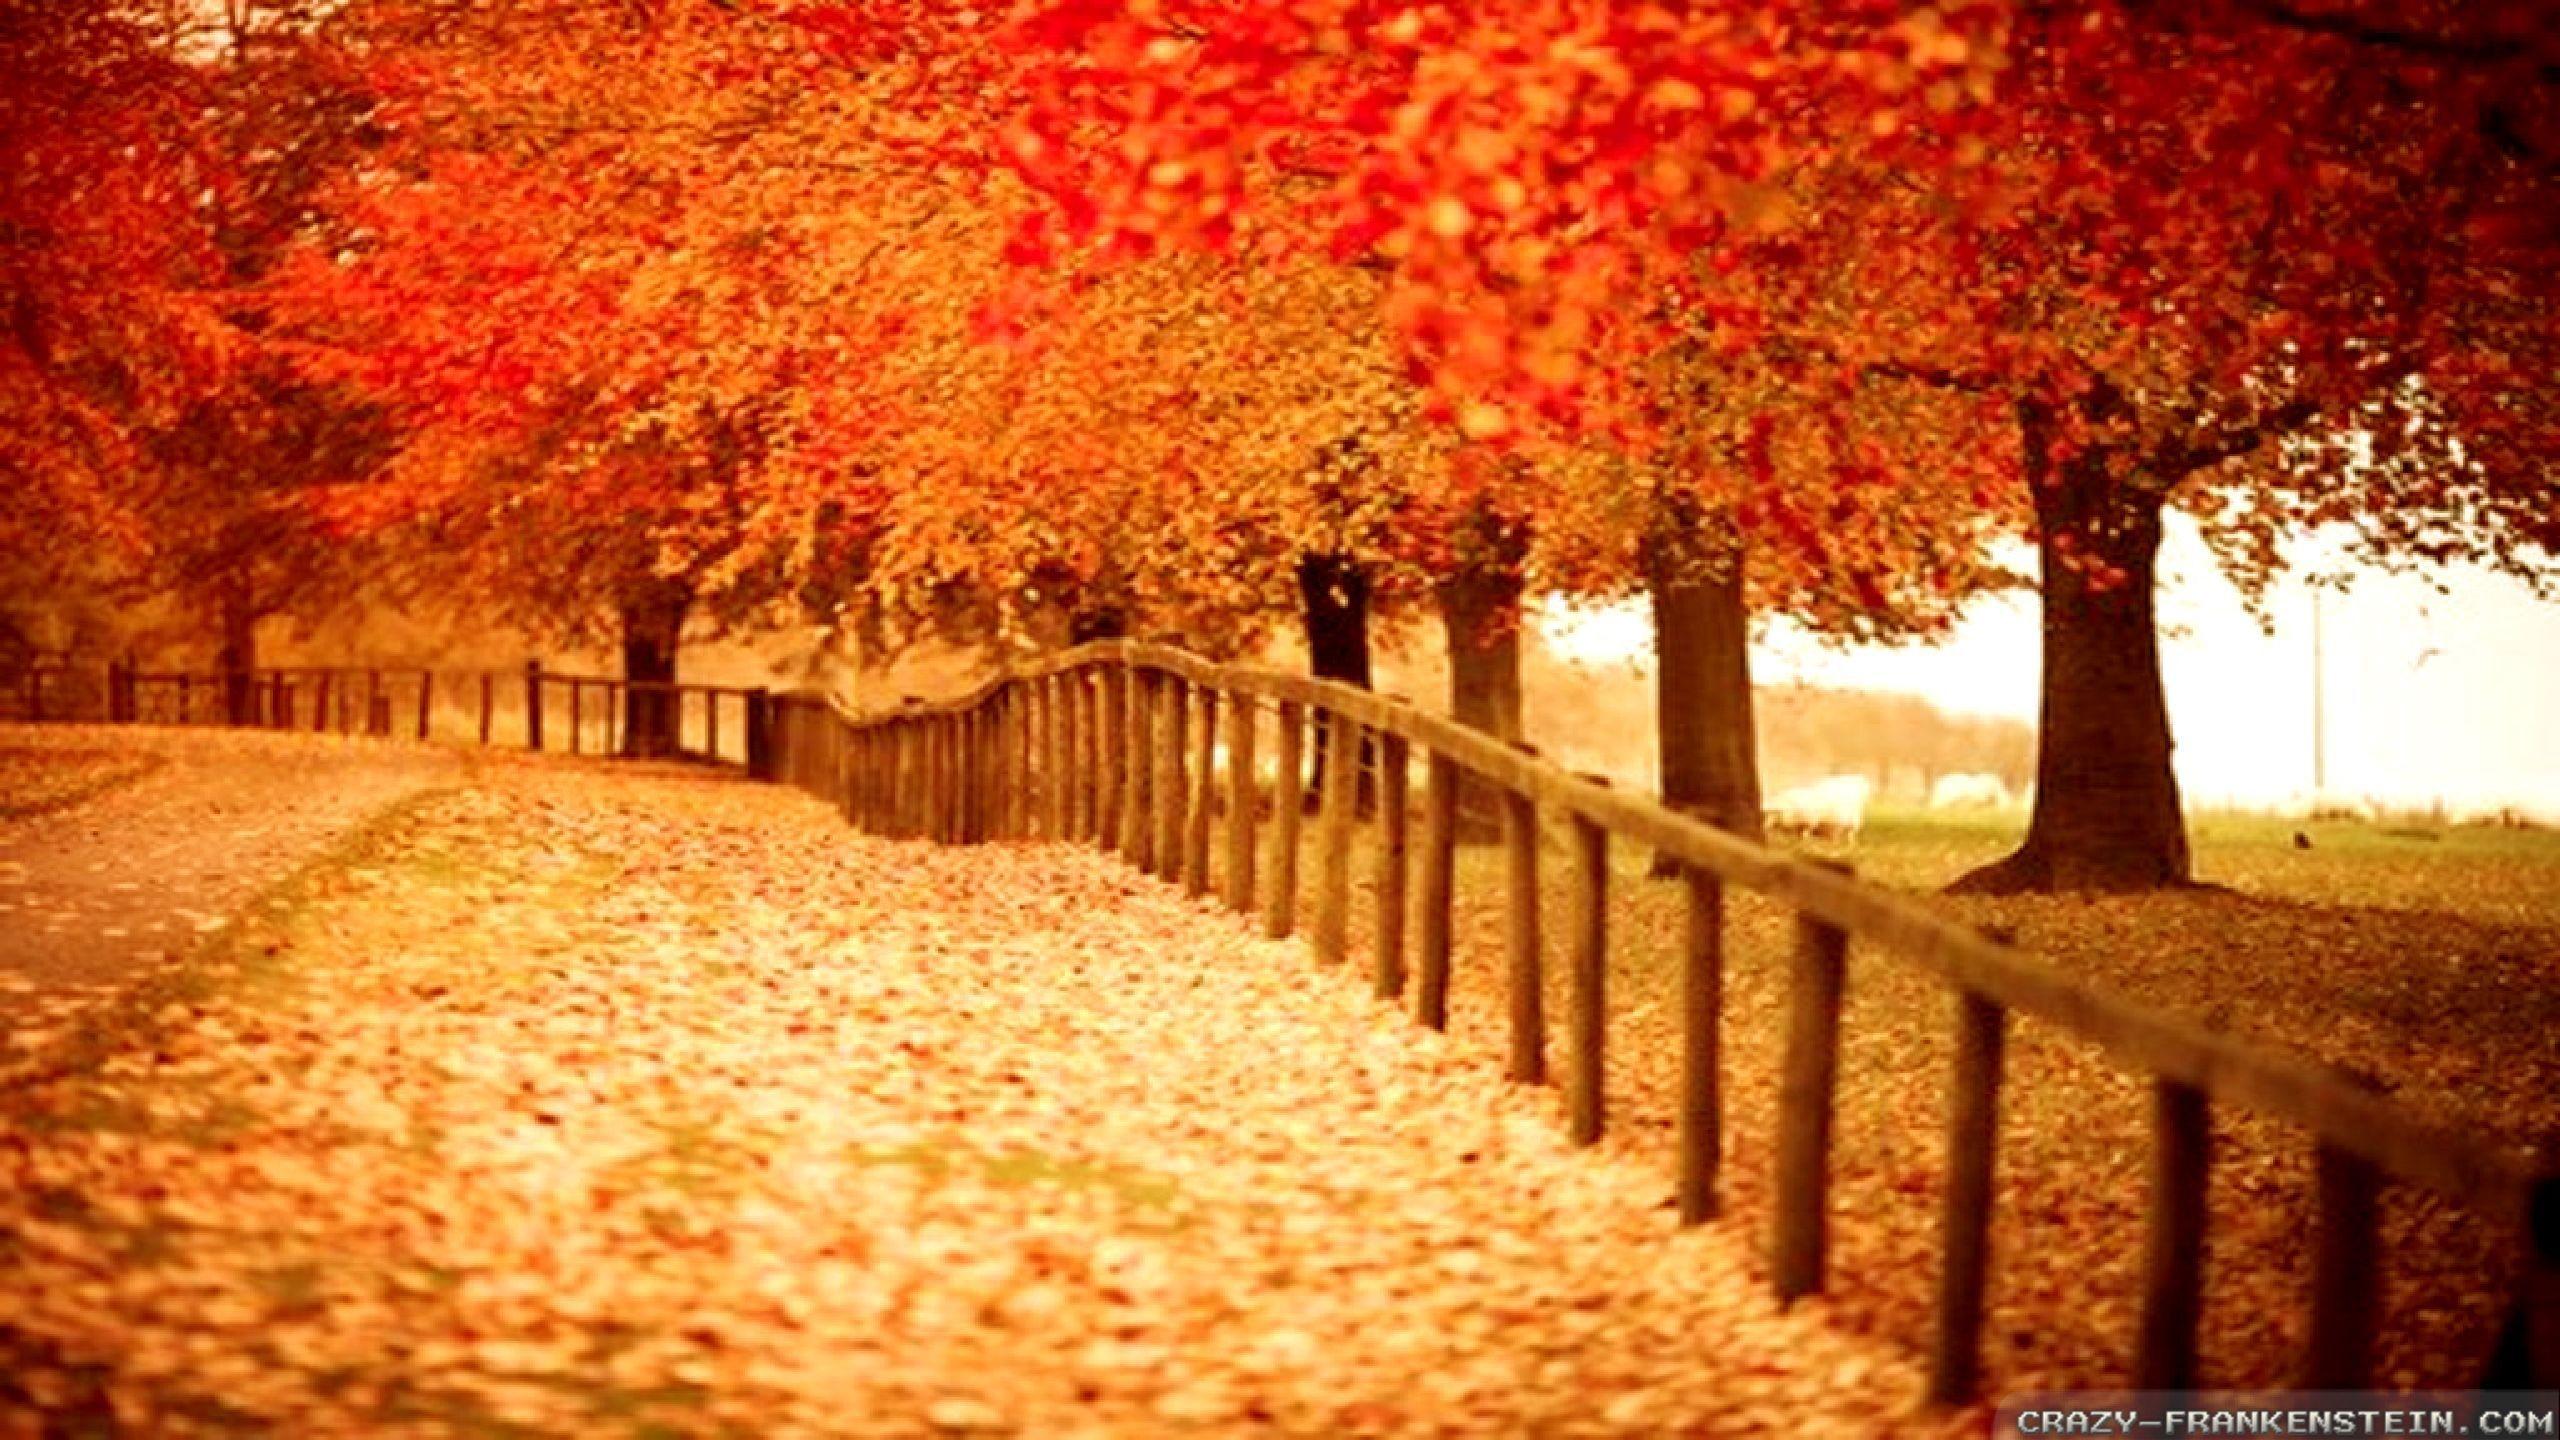 Fall Themed Desktop Backgrounds (46 Wallpapers)